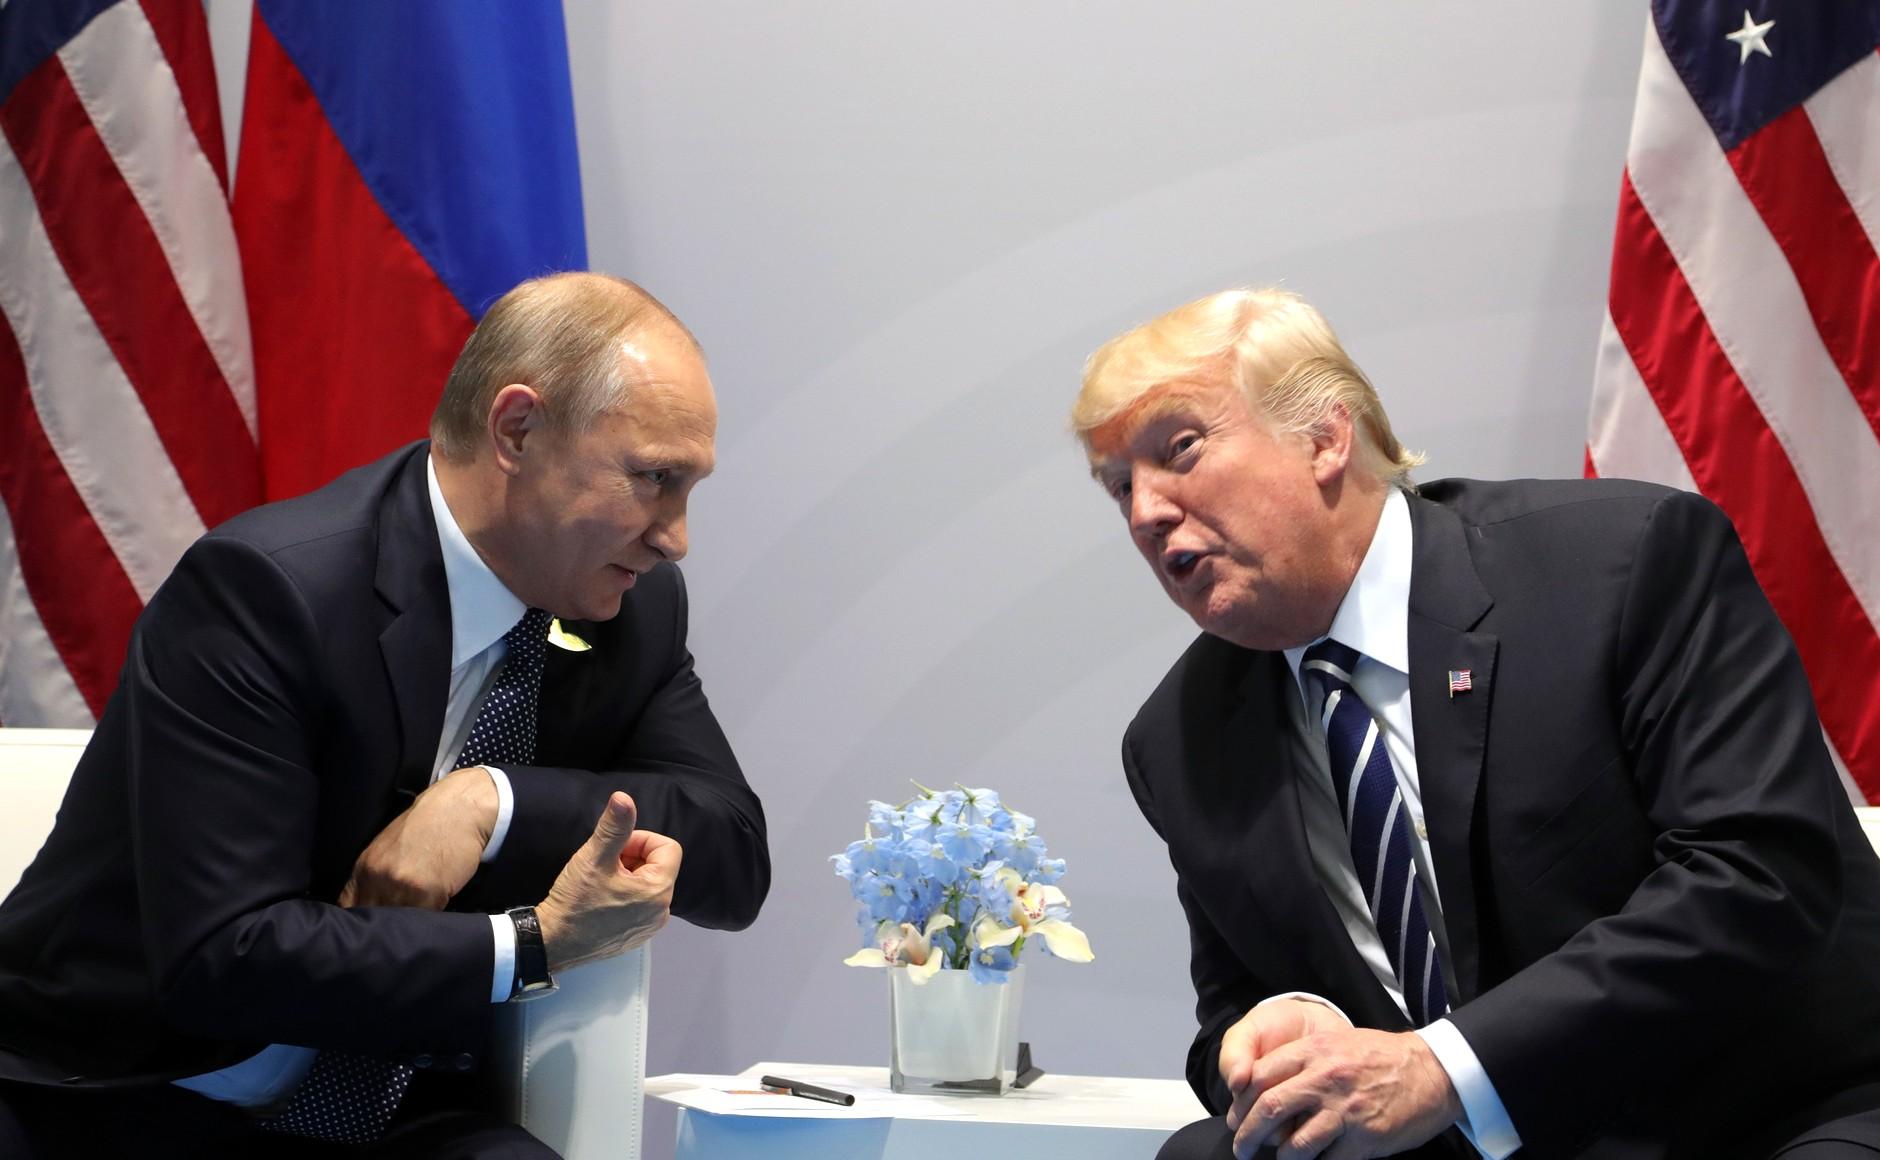 http://kremlin.ru/events/president/news/55006/photos/49330